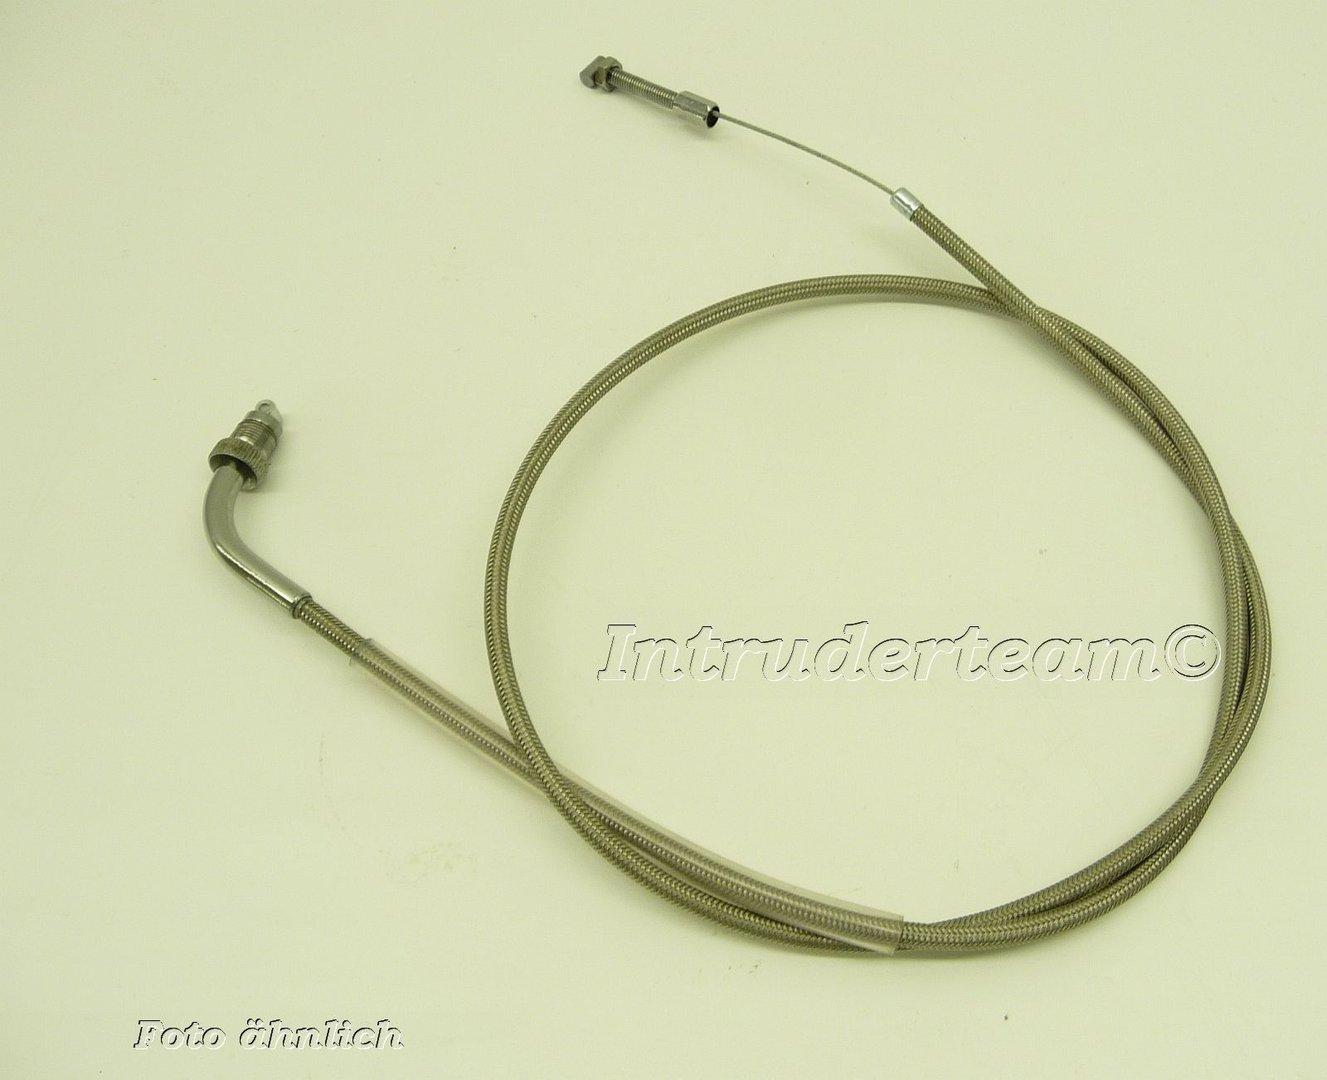 Gaszug Stahlflex standard +40cm zurück Idle cable Yamaha XVS950 V-Star 950